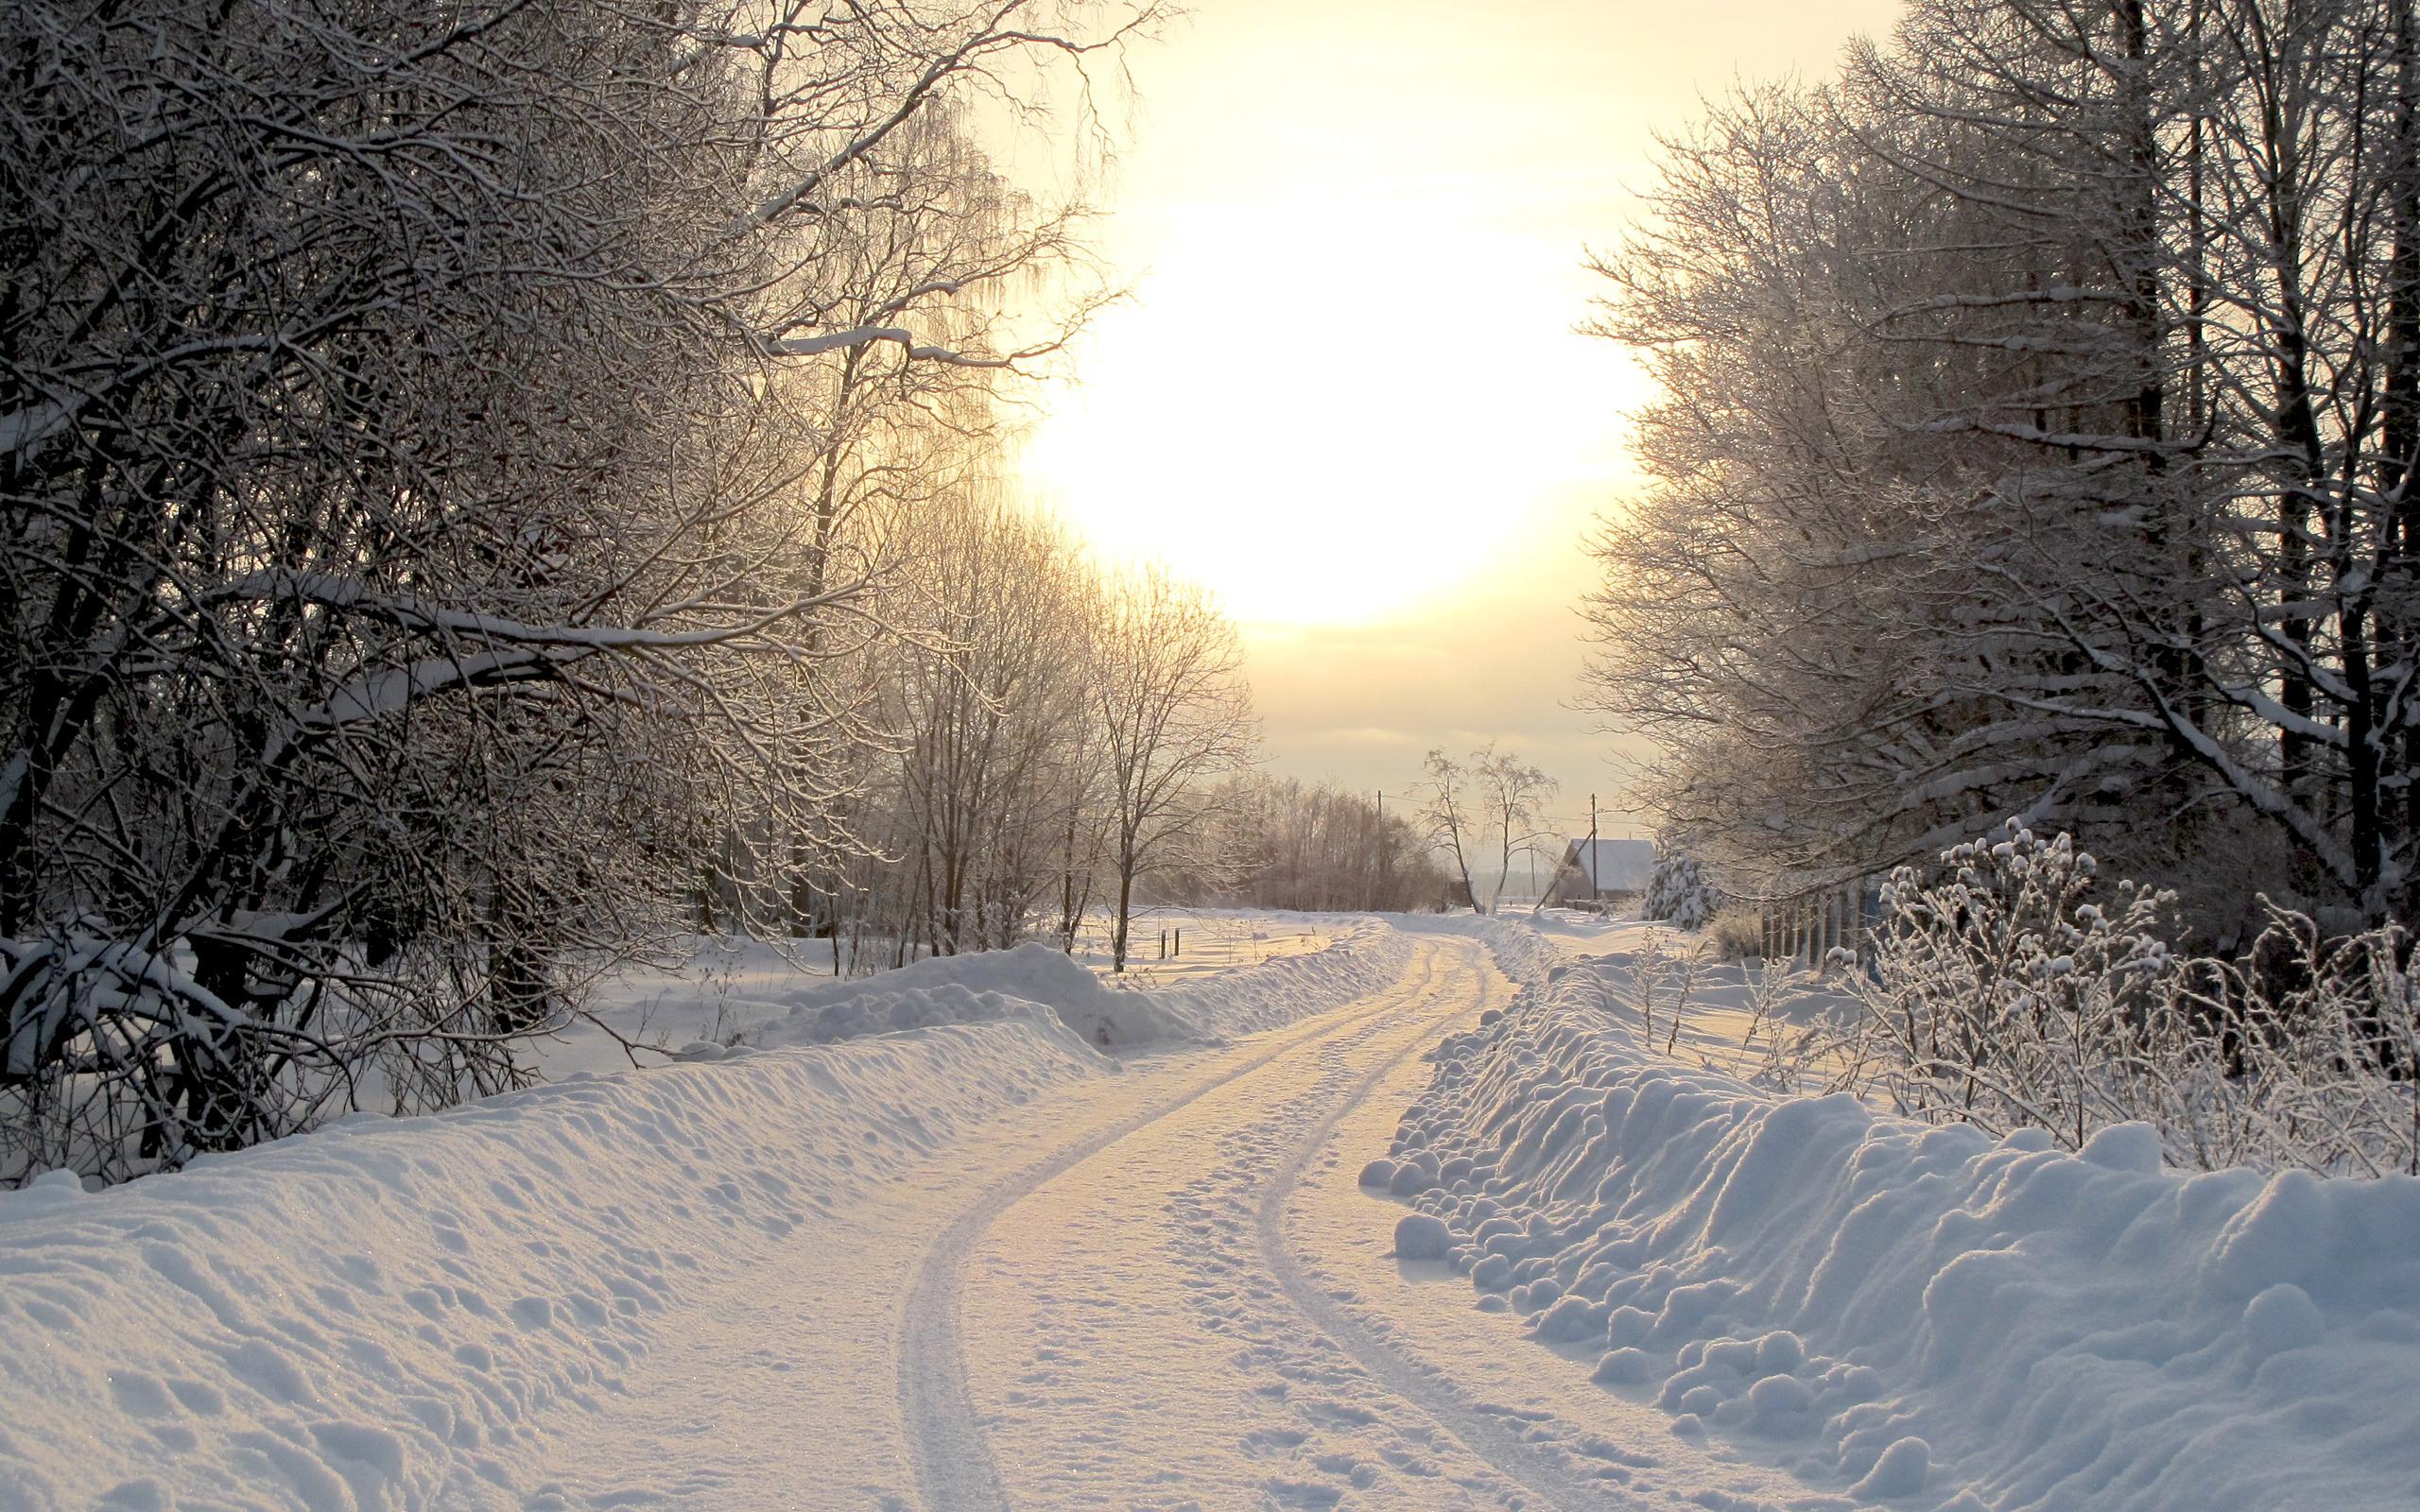 Дом зима дорога снег загрузить